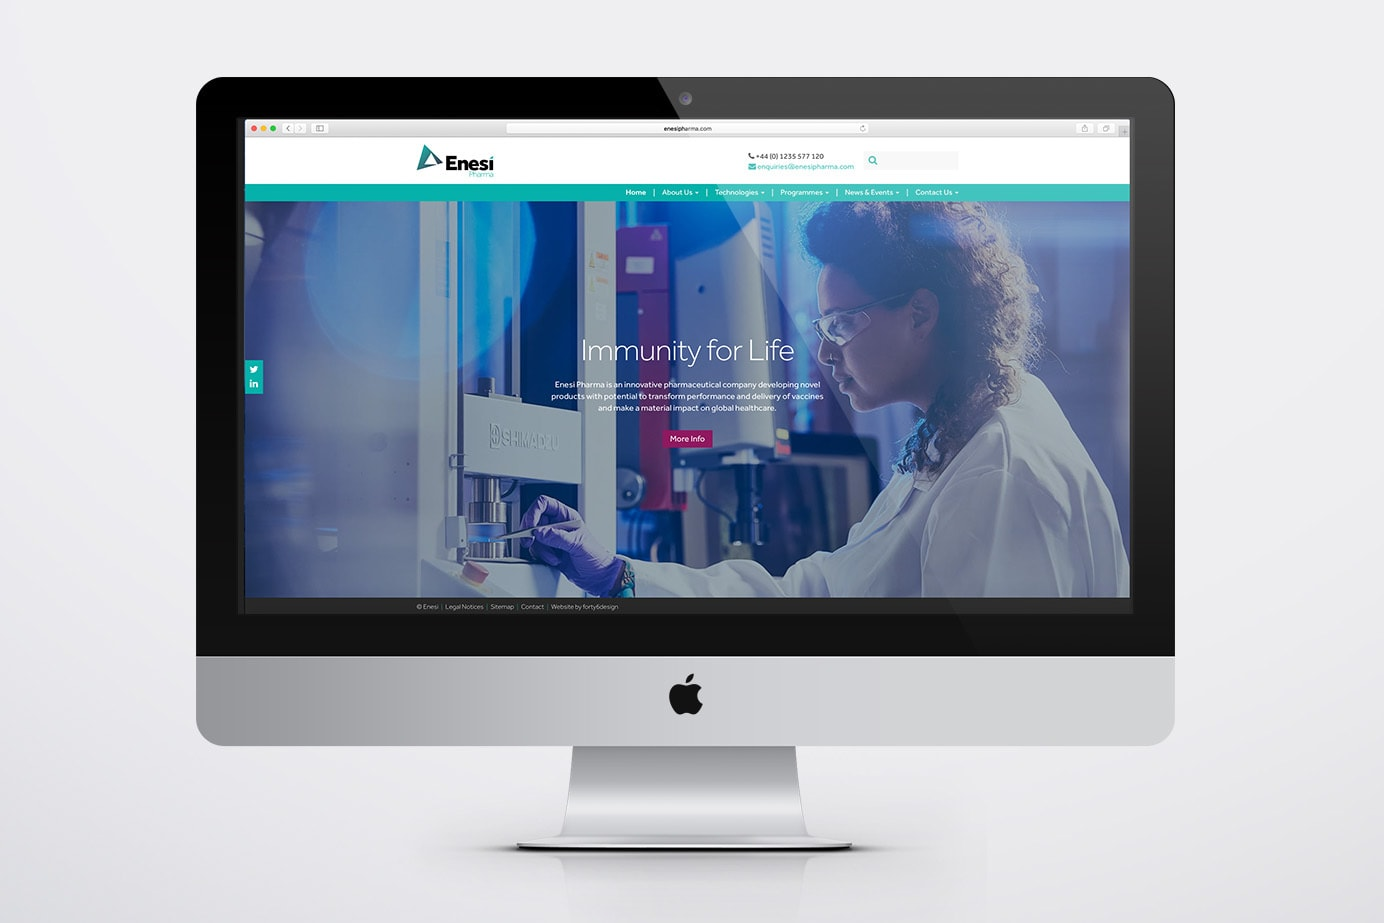 forty6 design_Enesi website